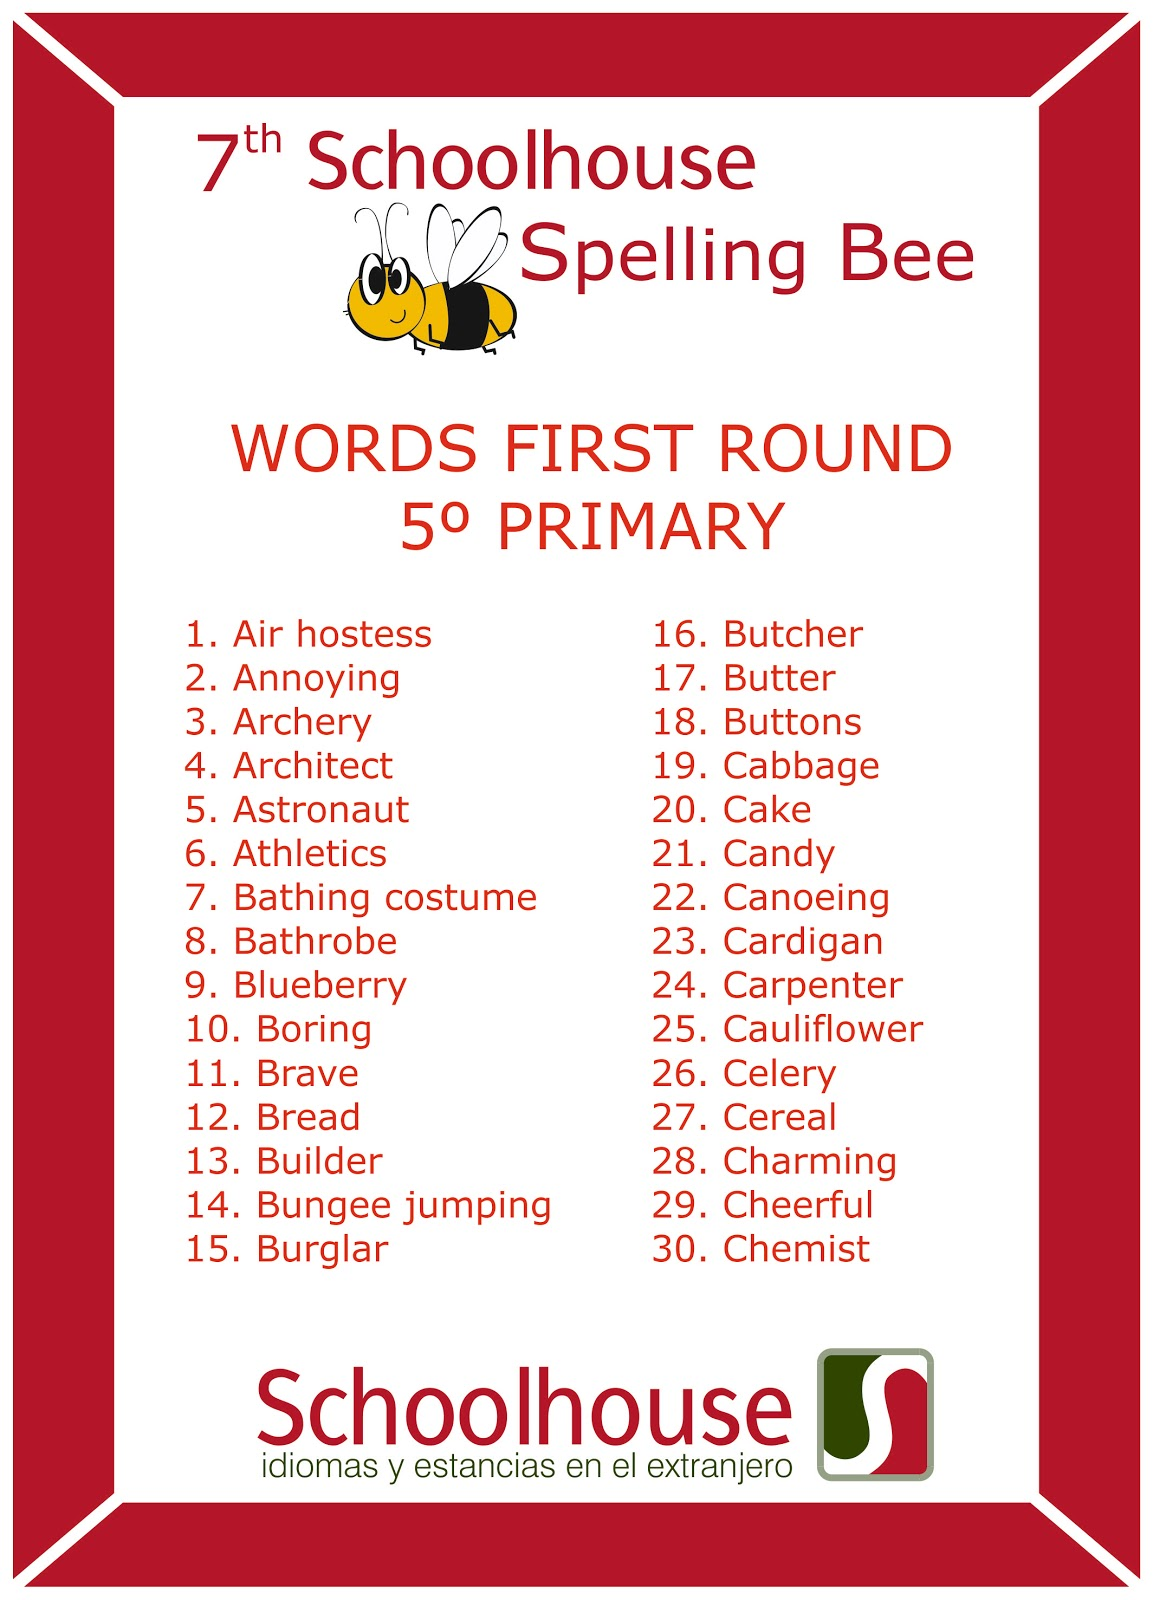 +Spelling+Bee+Word+List Spelling Bee Word List. .Adult Spelling Bee ...